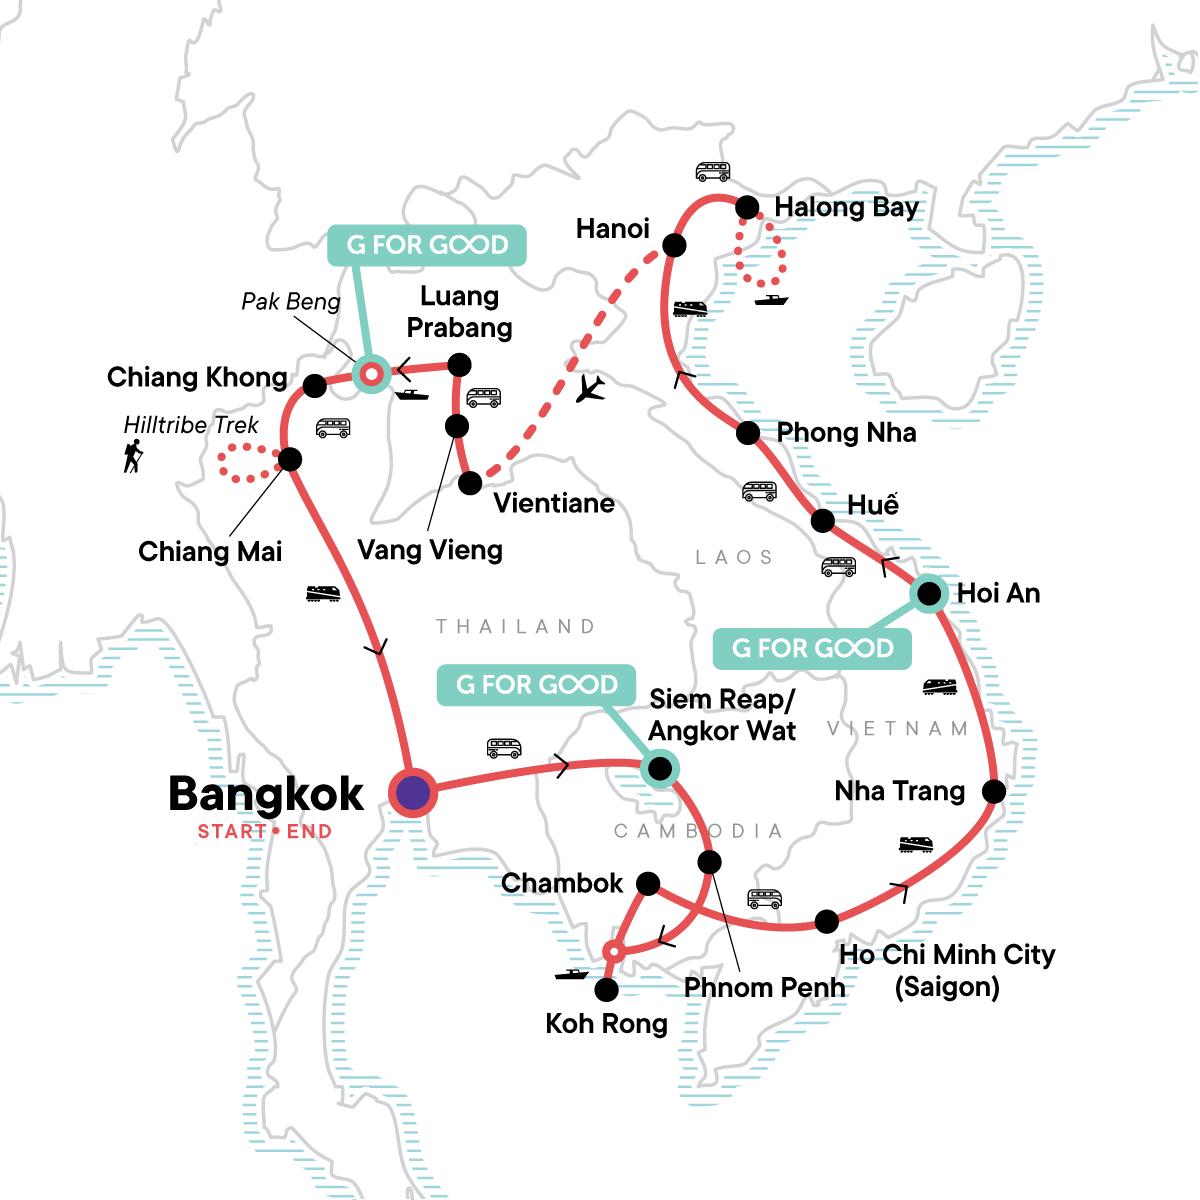 Indochina: Northern Hilltribe Trekking & Beach Vibes Map